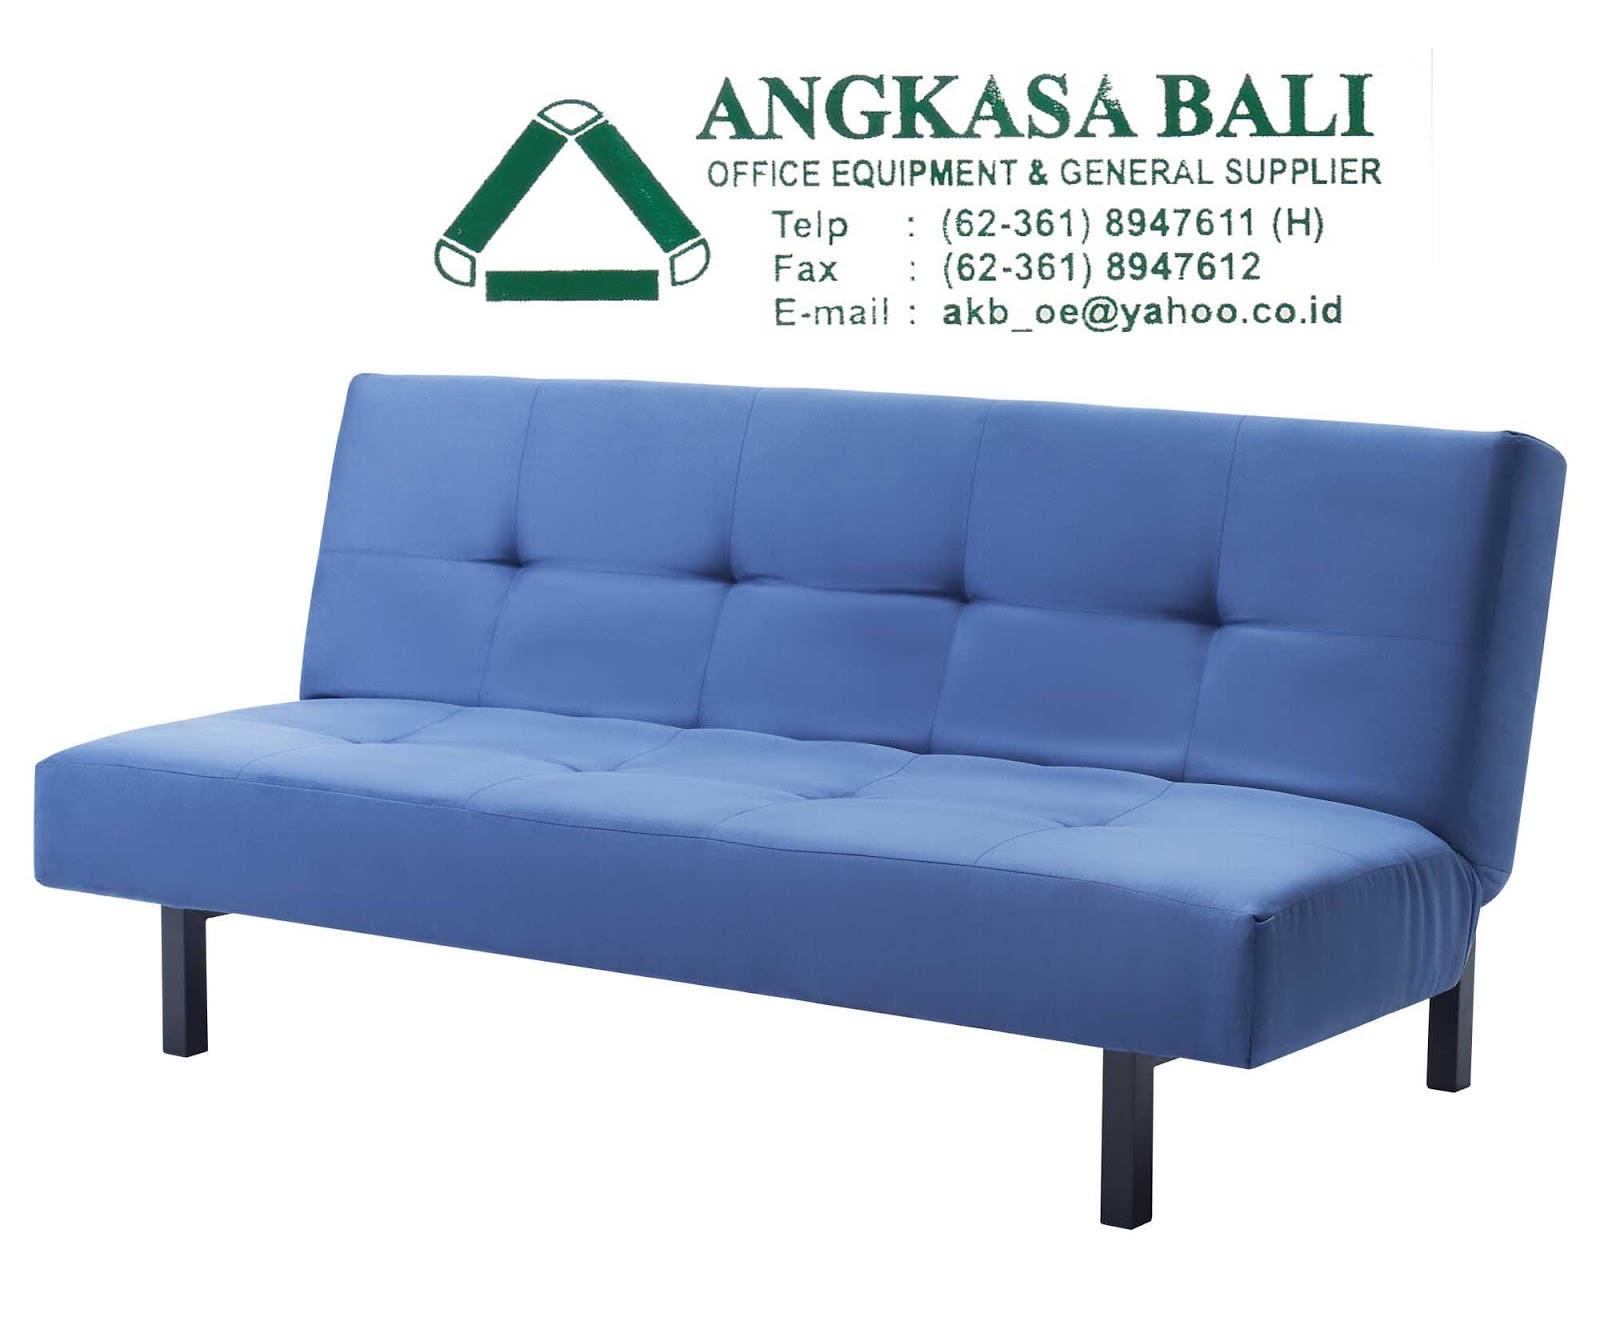 Jual Sofa Bed Murah Di Jakarta Selatan Divani Casa Anchusa Modern Blue Fabric Sectional Bekas Brokeasshome